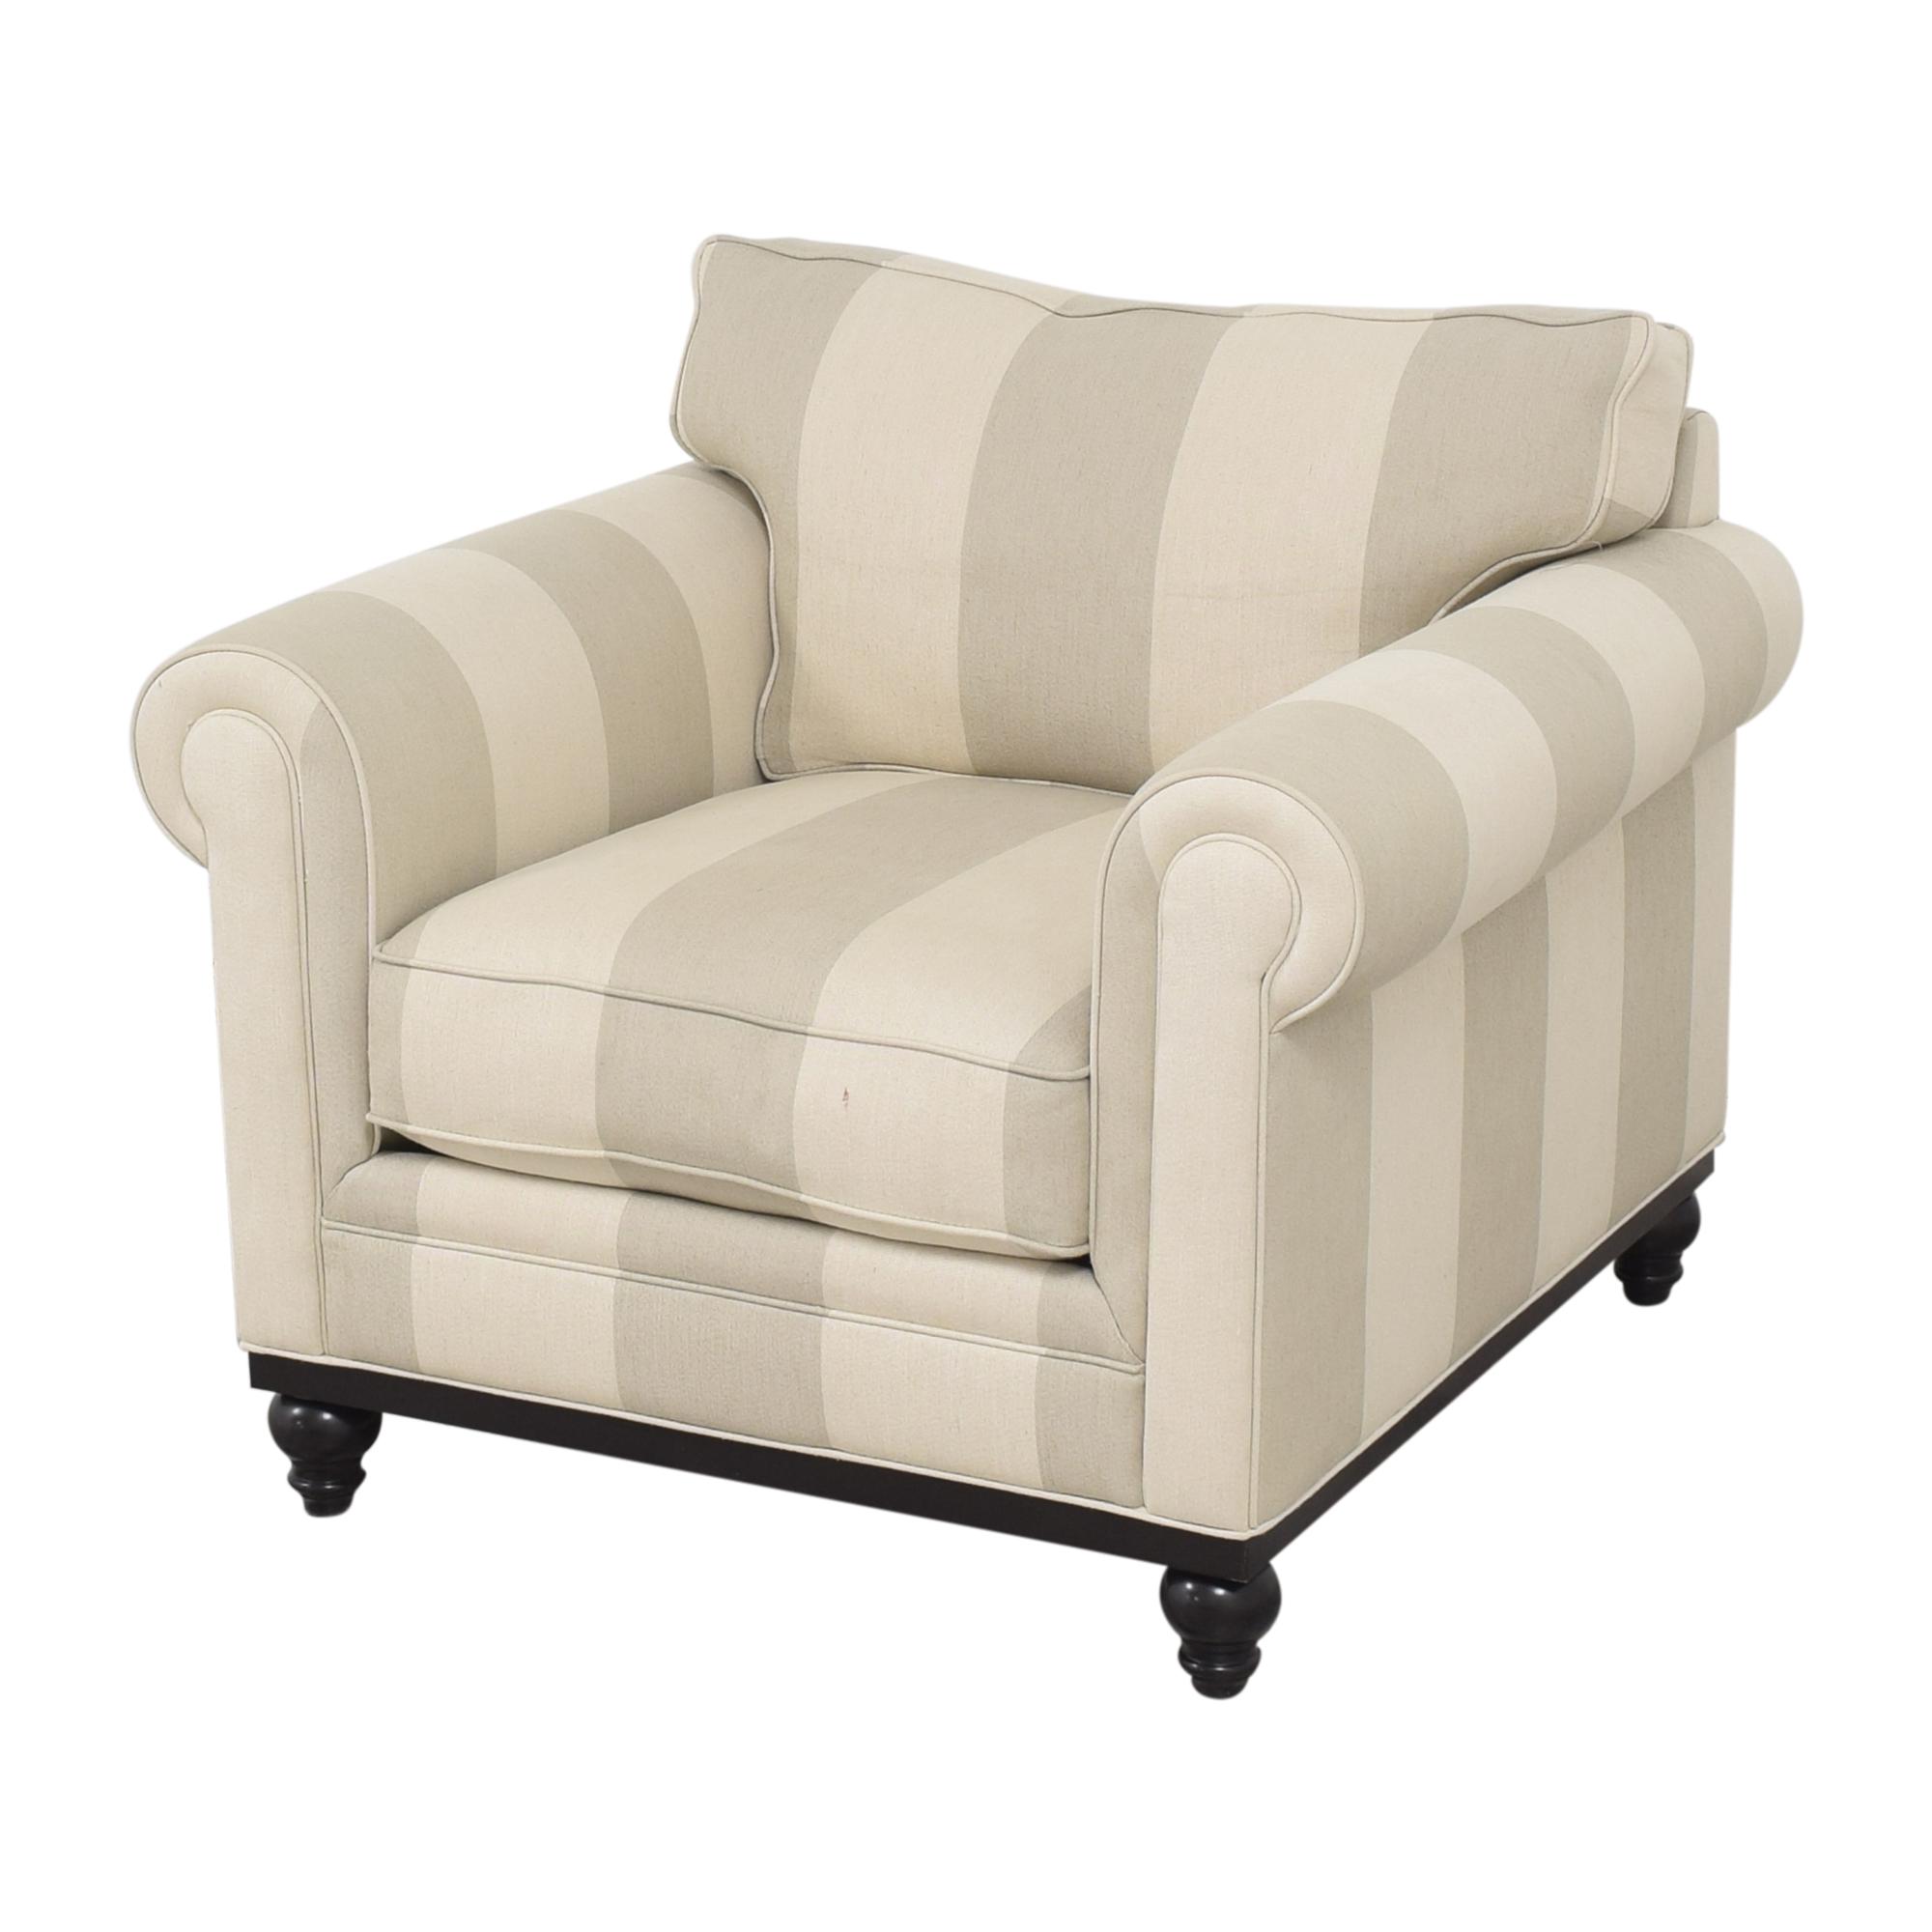 Macy's Macy's Martha Stewart Collection Stripe Club Chair and Ottoman price